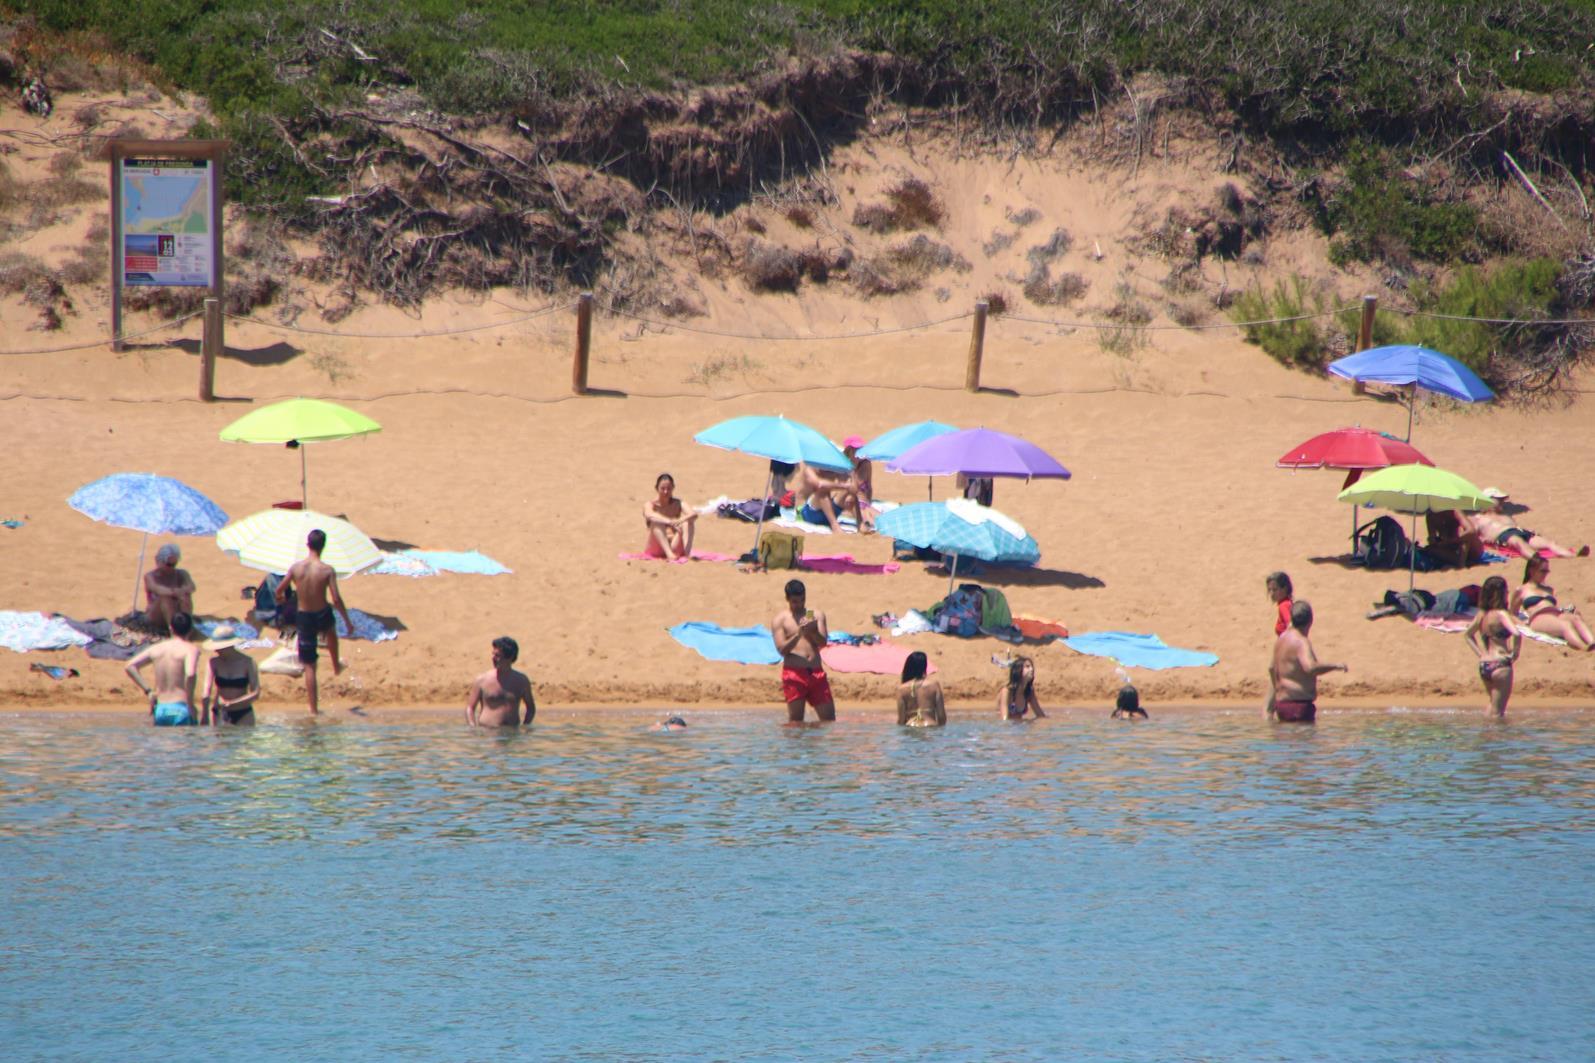 2018-07-27 Cala Pregonda, Menorca, Islas Baleares, Spain – Come